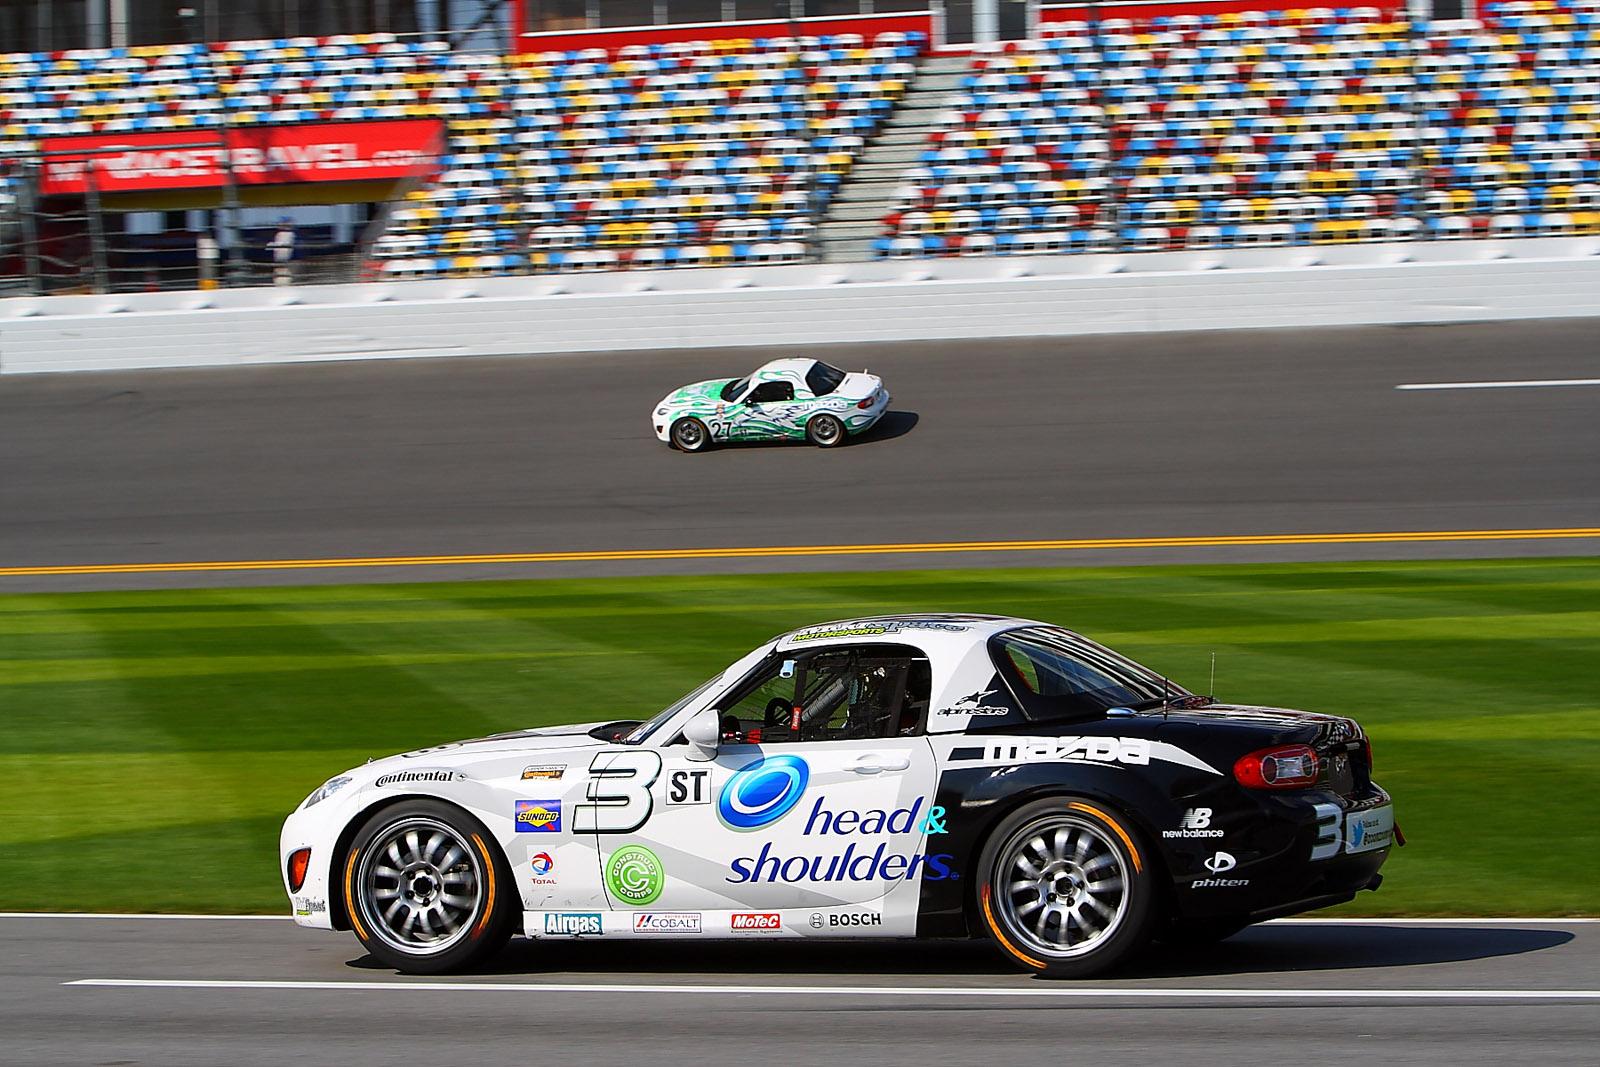 CJ Wilson: Racer, Pitcher, Petrolhead Part 2